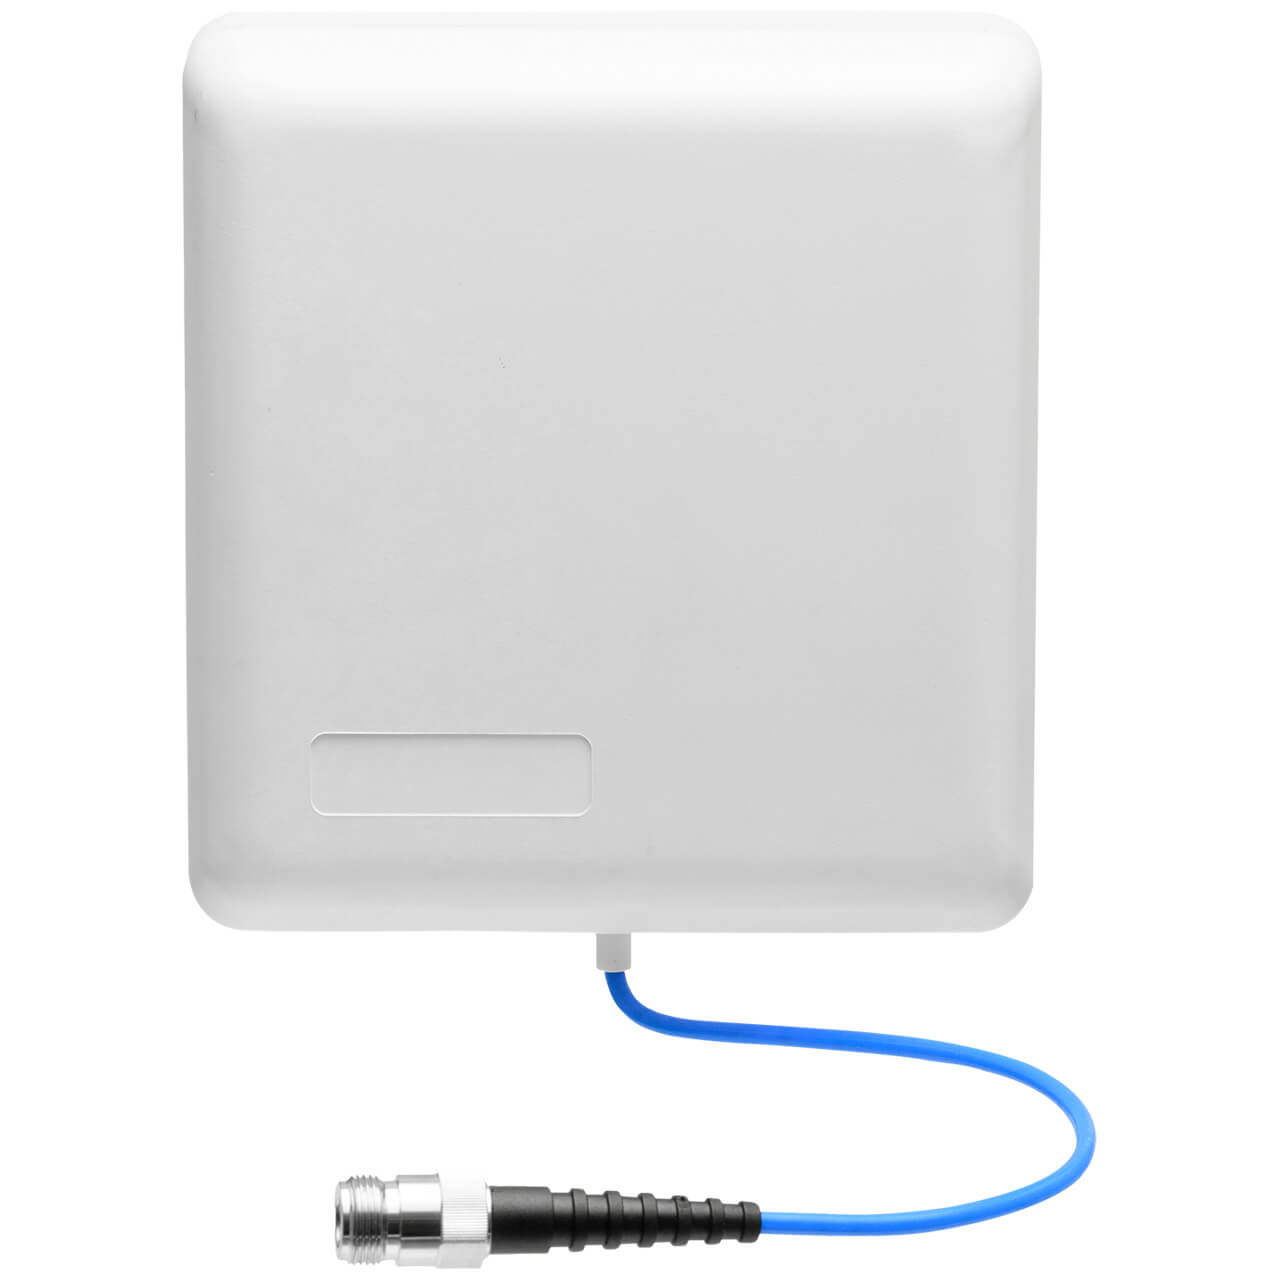 The Indoor 5G Board - Indoor Wall Mount Antenna